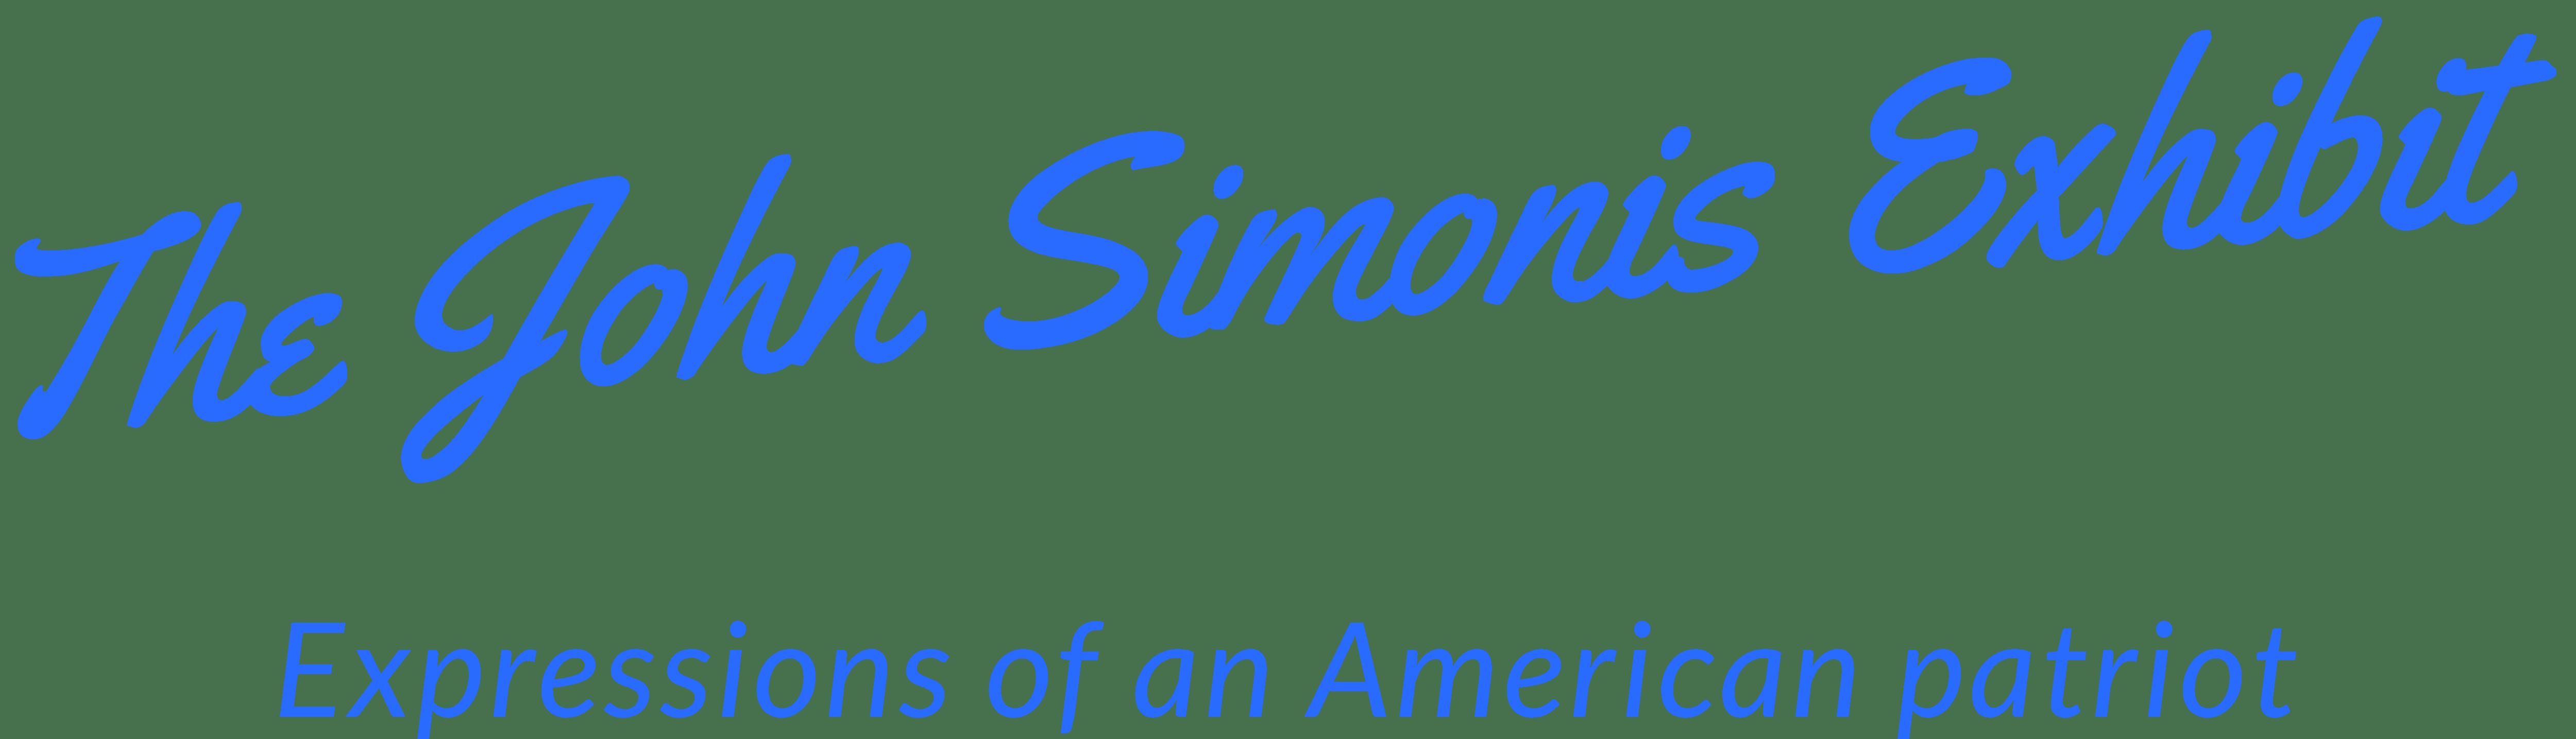 The John Simonis Art Gallery